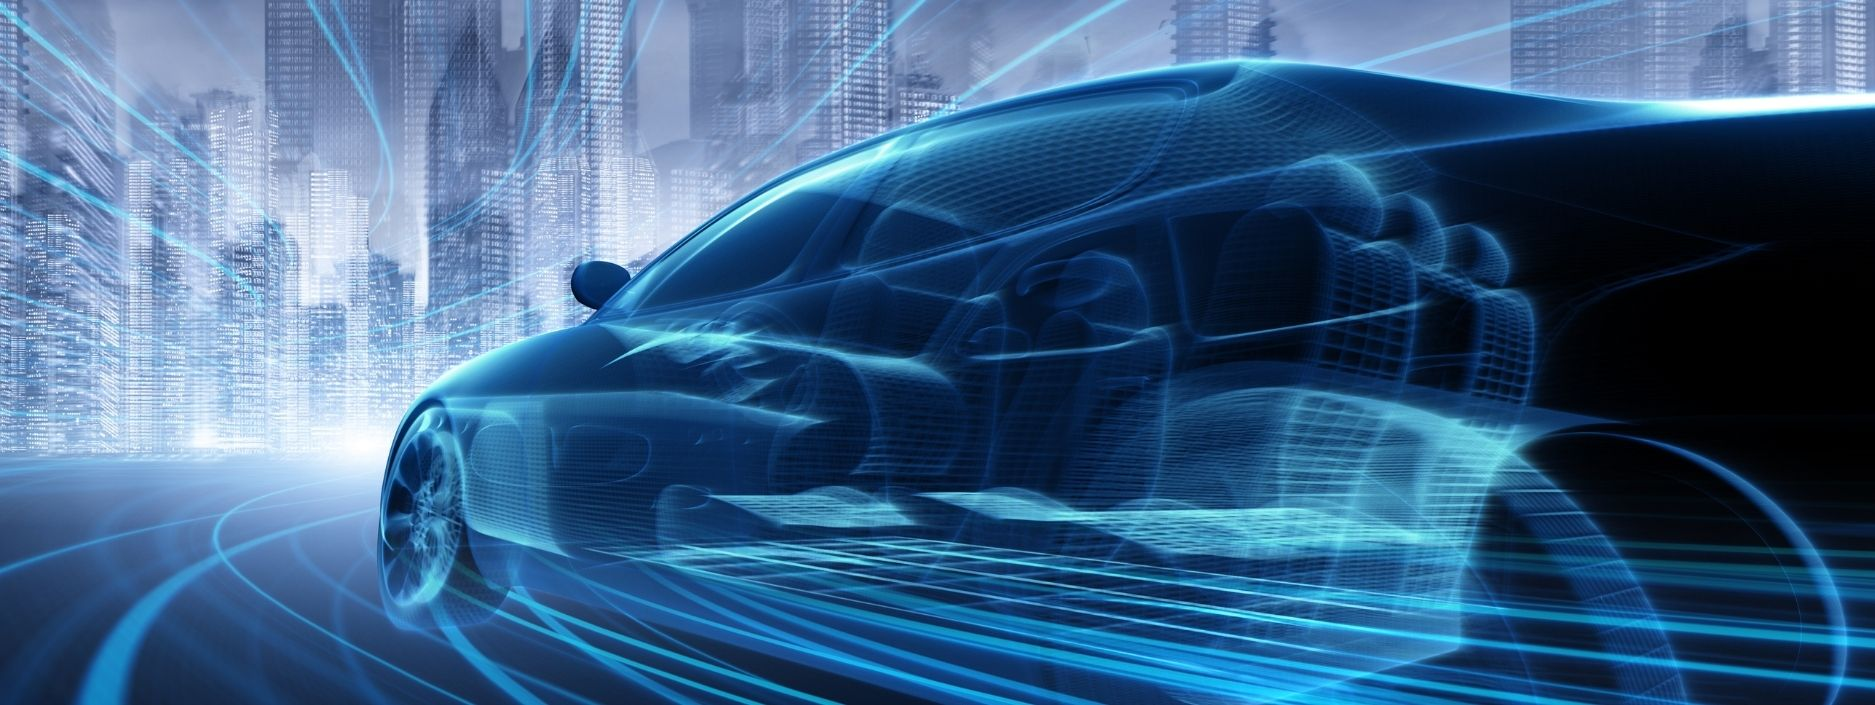 Future car concept